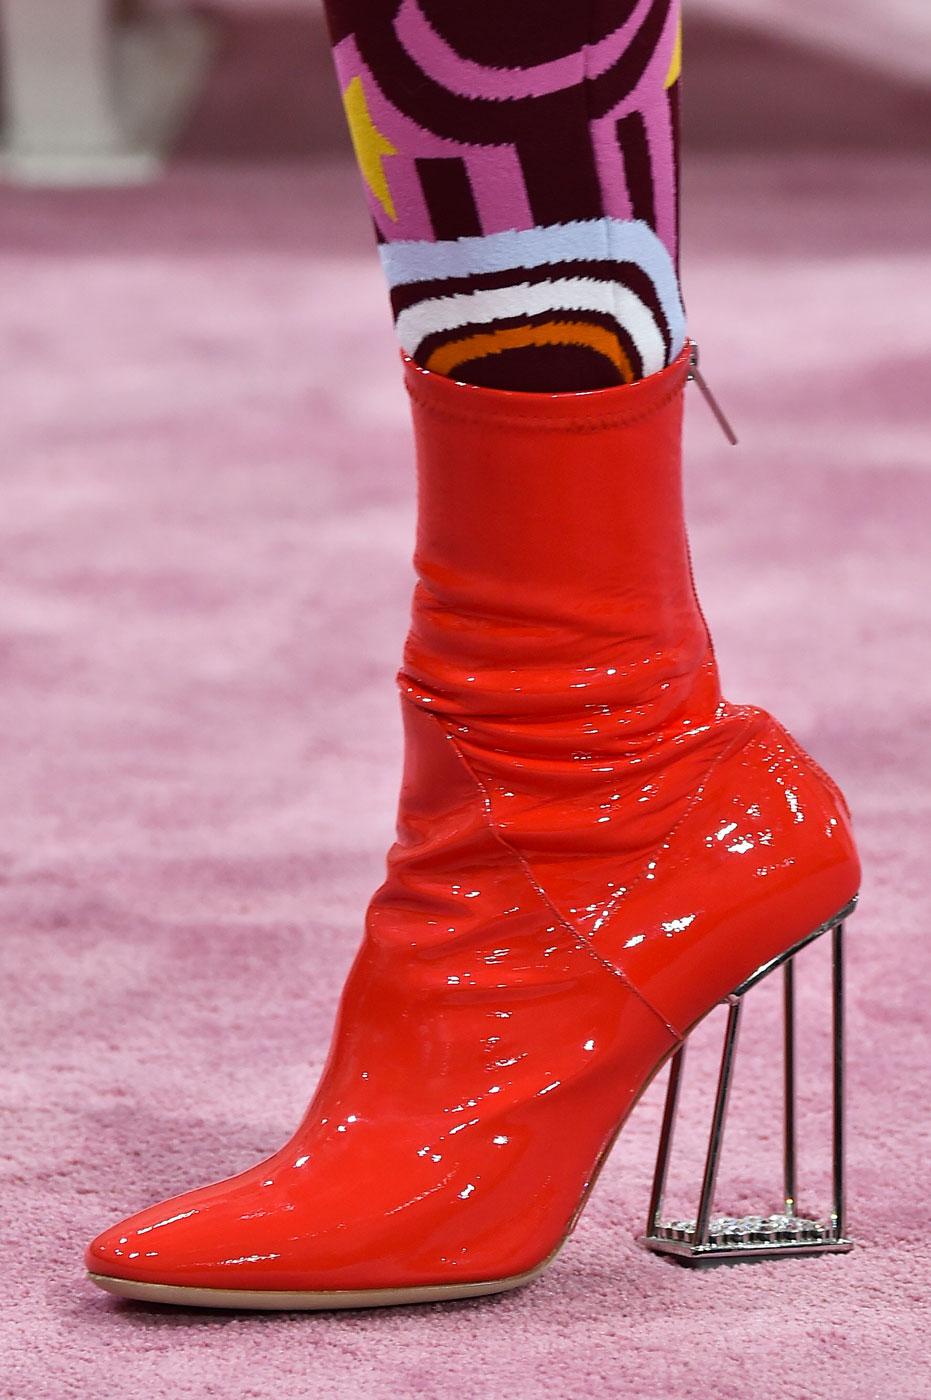 Christian-Dior-fashion-runway-show-close-ups-haute-couture-paris-spring-summer-2015-the-impression-156